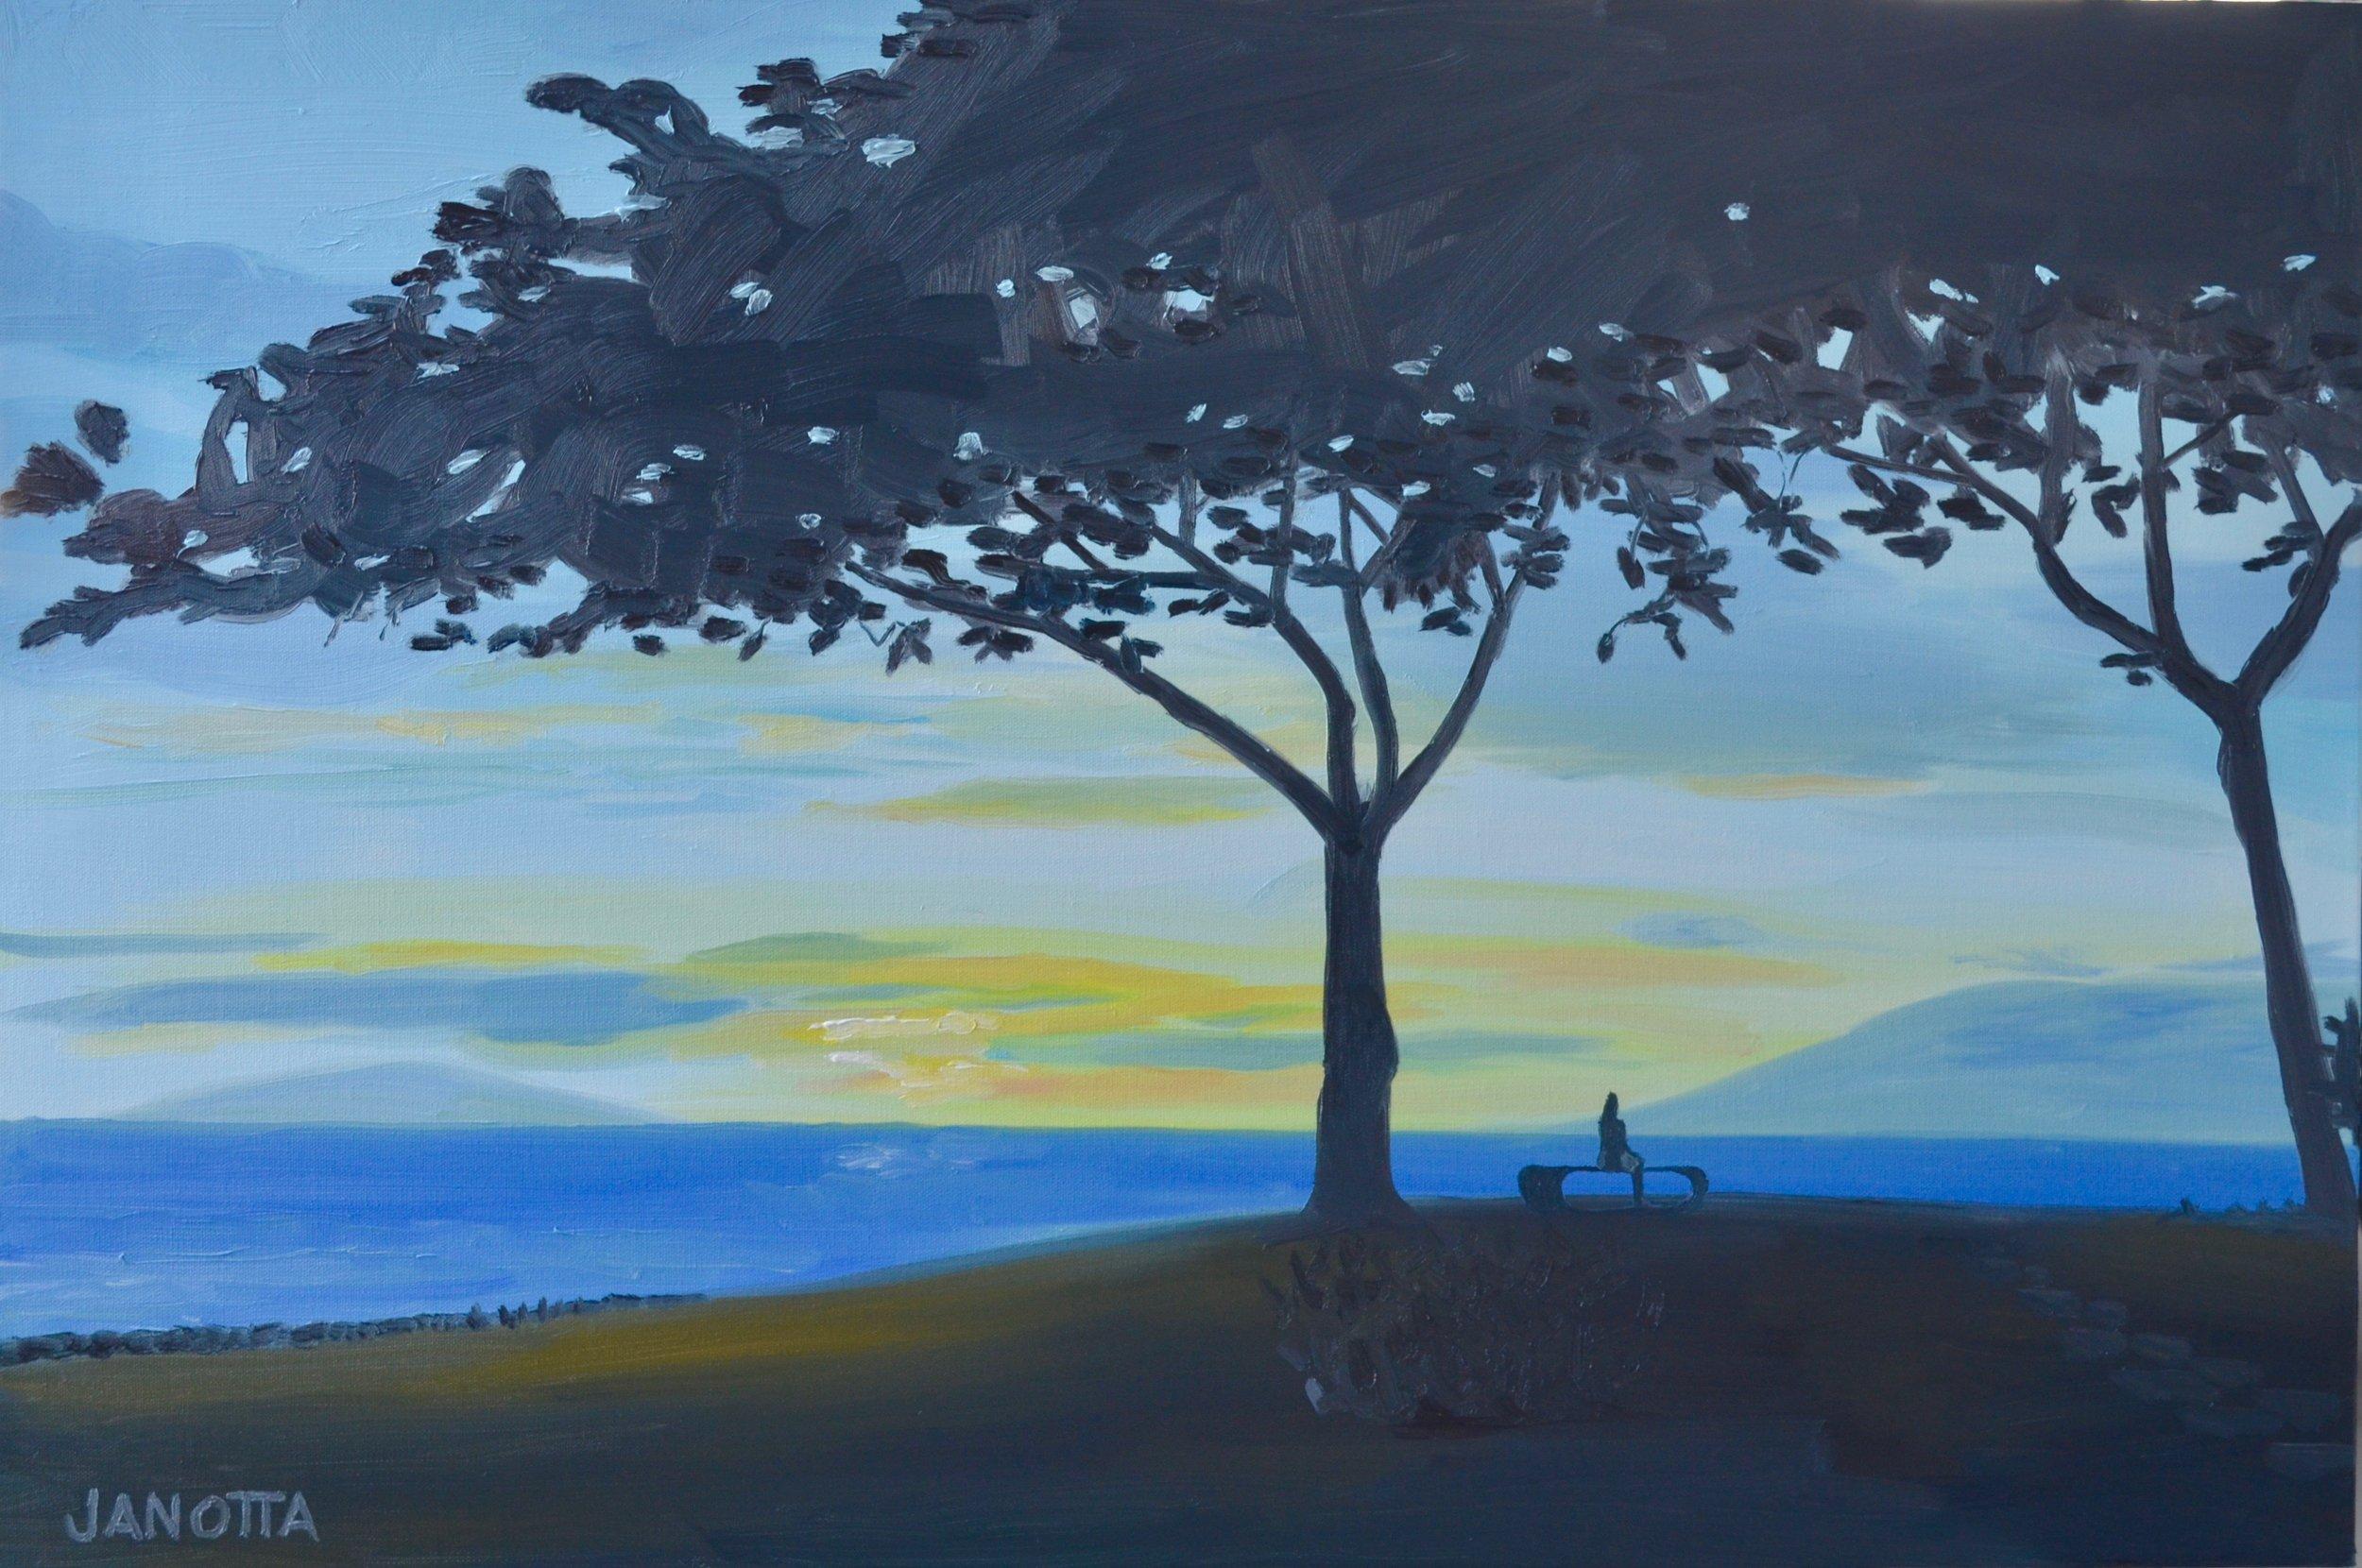 MR. B'S TREE 24x36 oiloncanvas